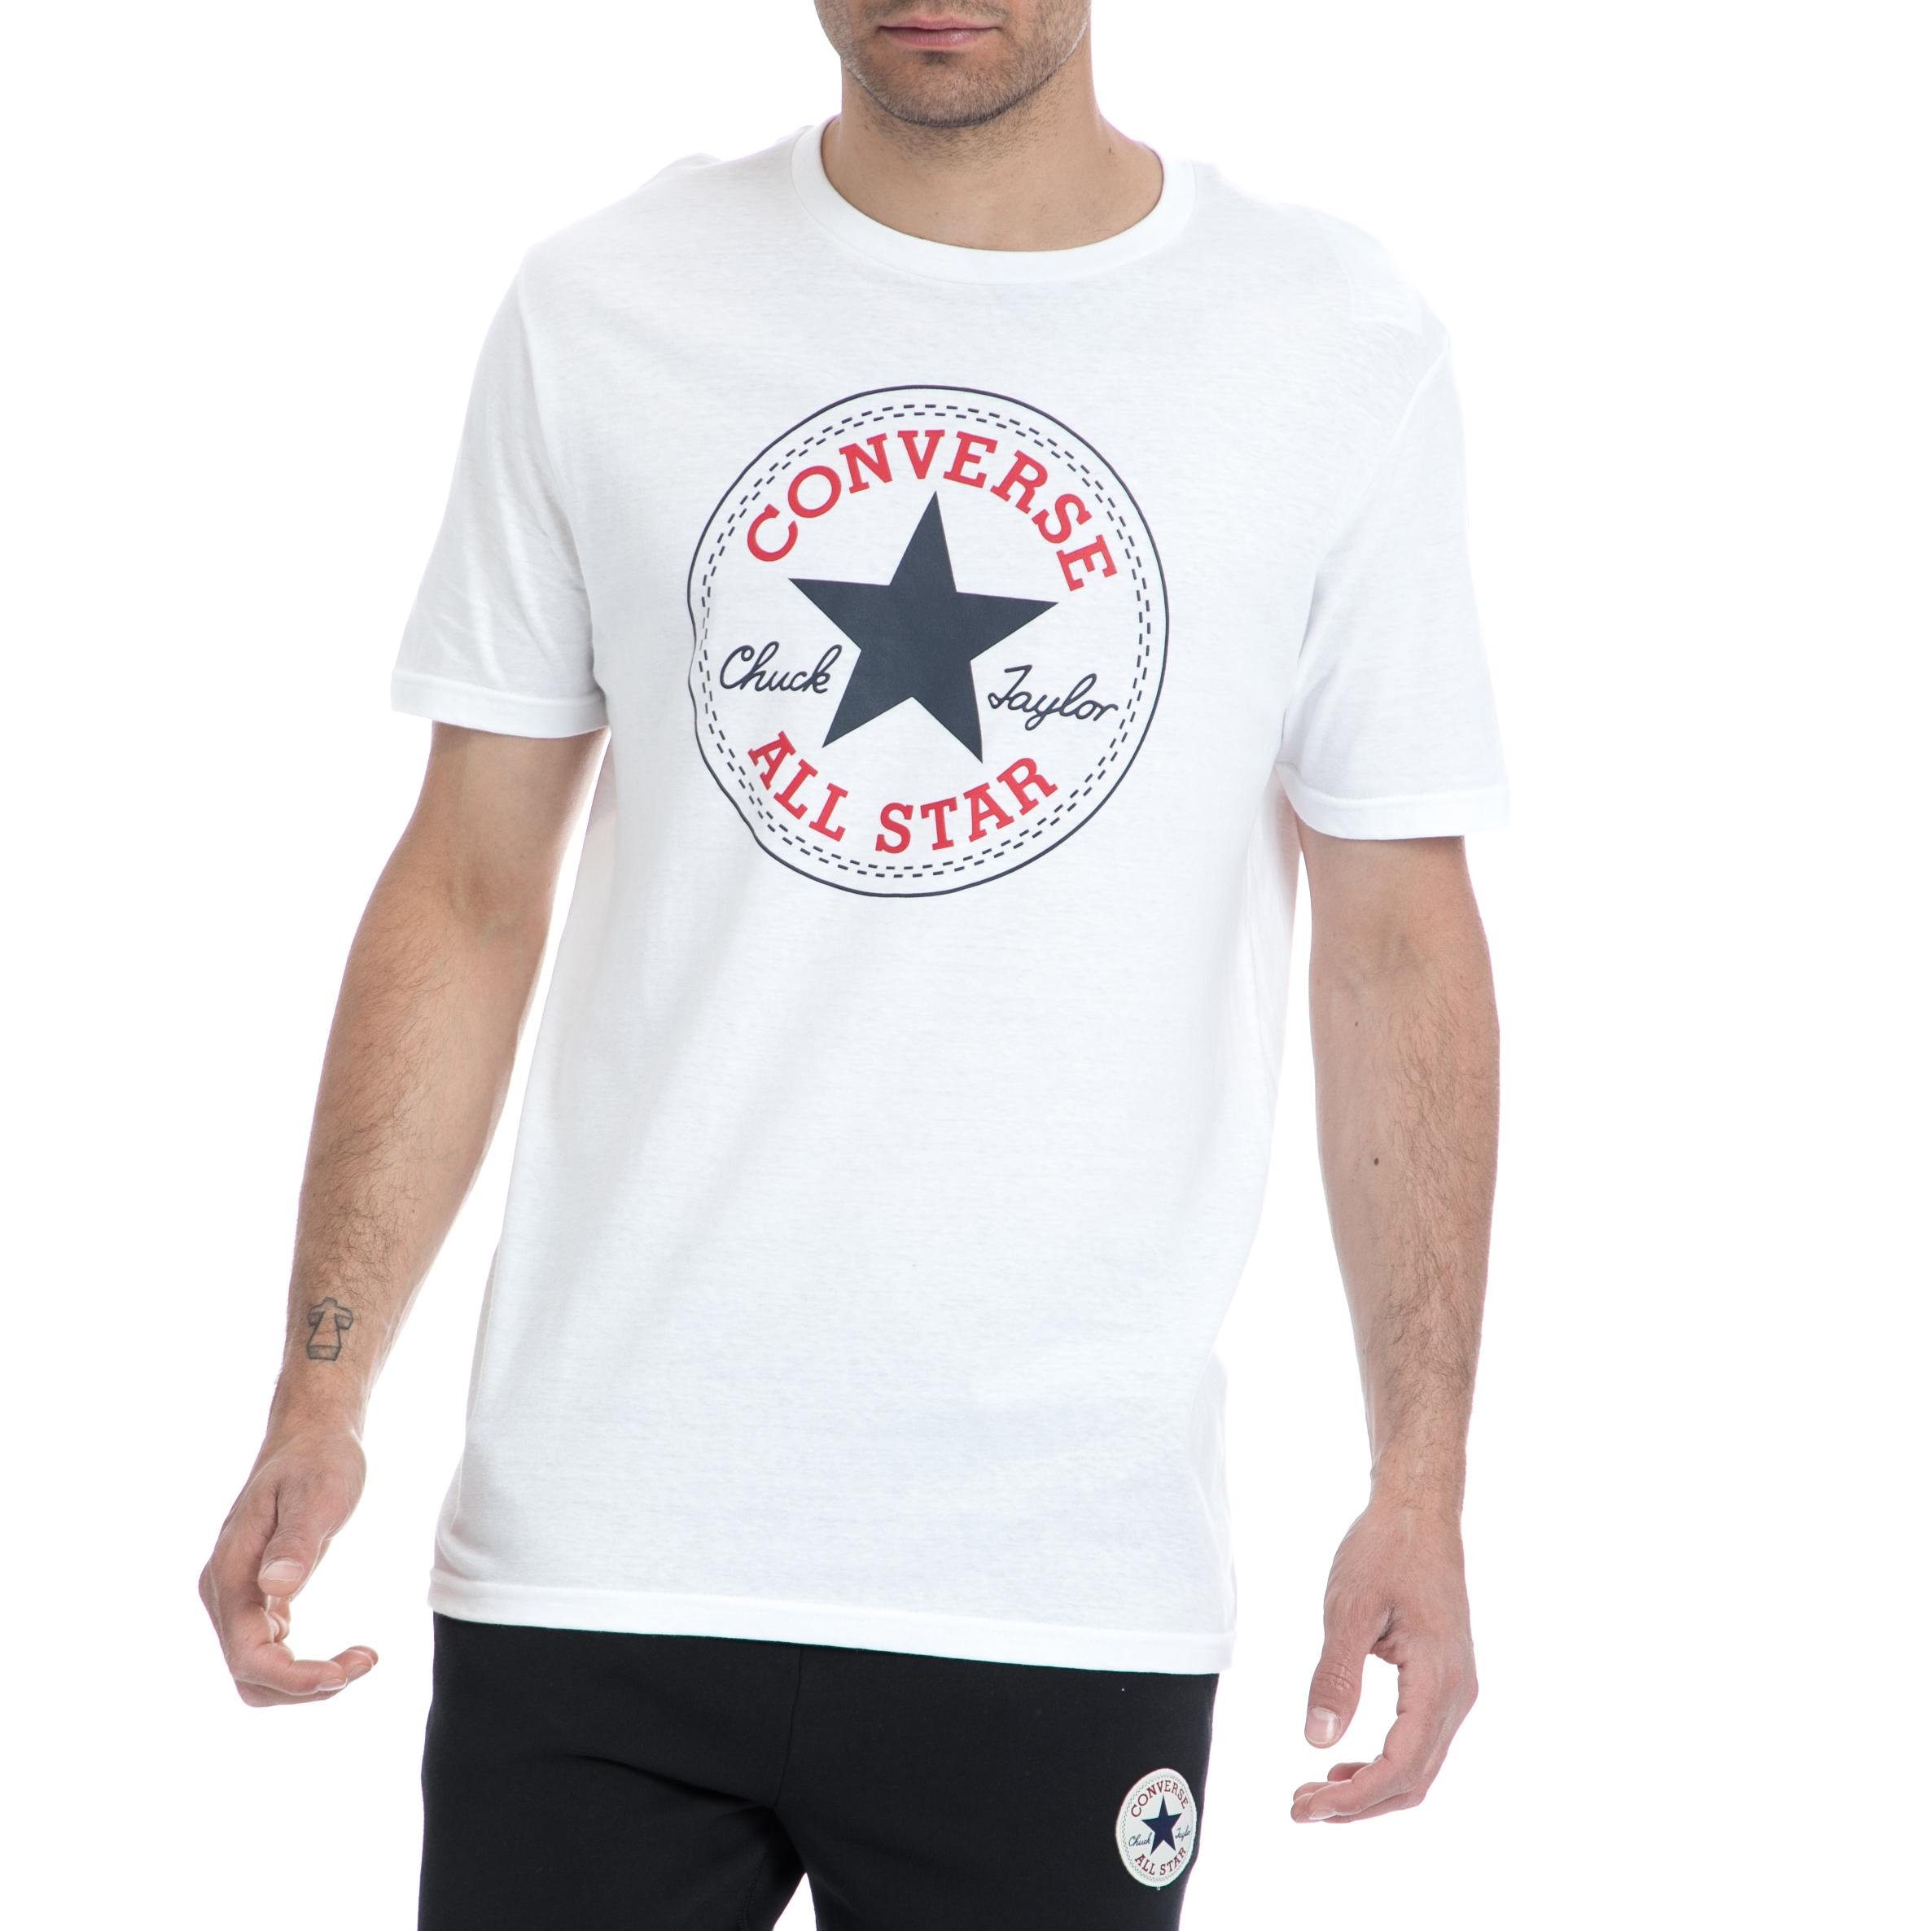 CONVERSE - Ανδρική μπλούζα Converse λευκή ανδρικά ρούχα αθλητικά t shirt